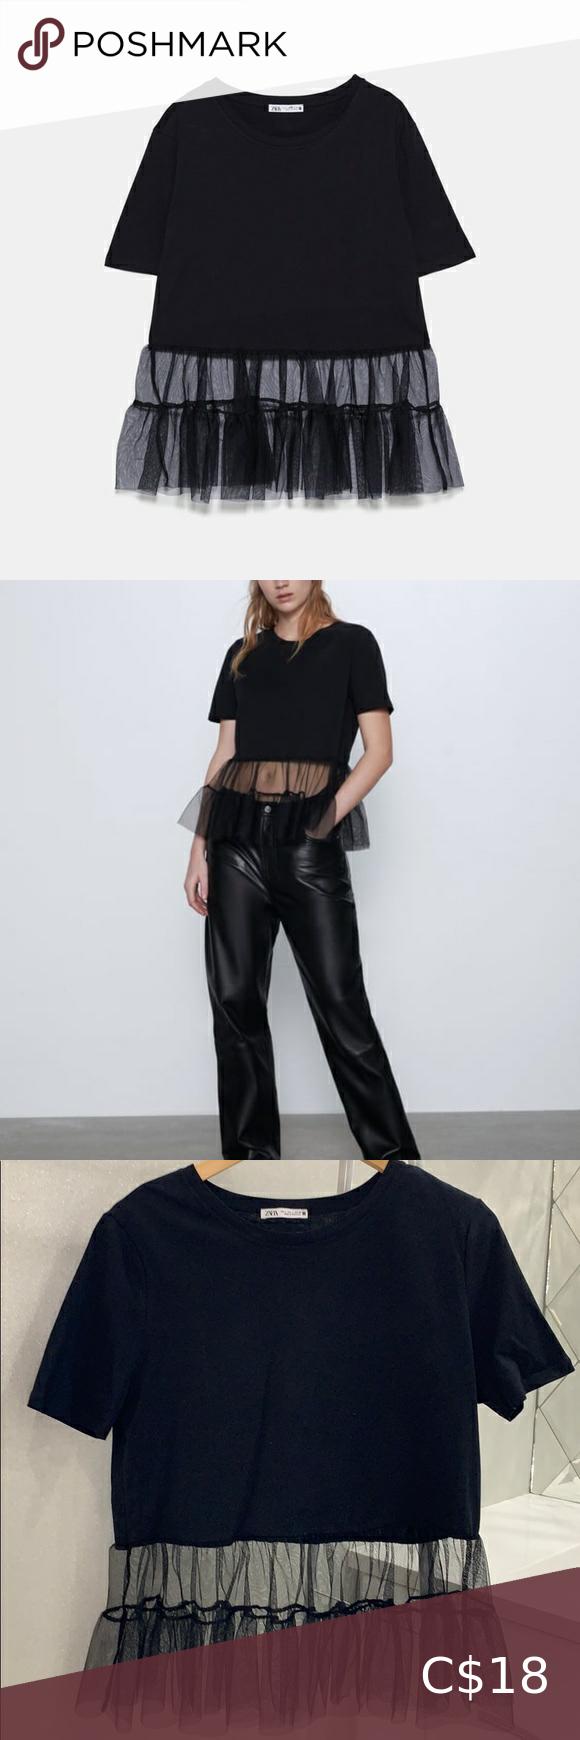 Zara // Black Tulle T-shirt with Ruffles